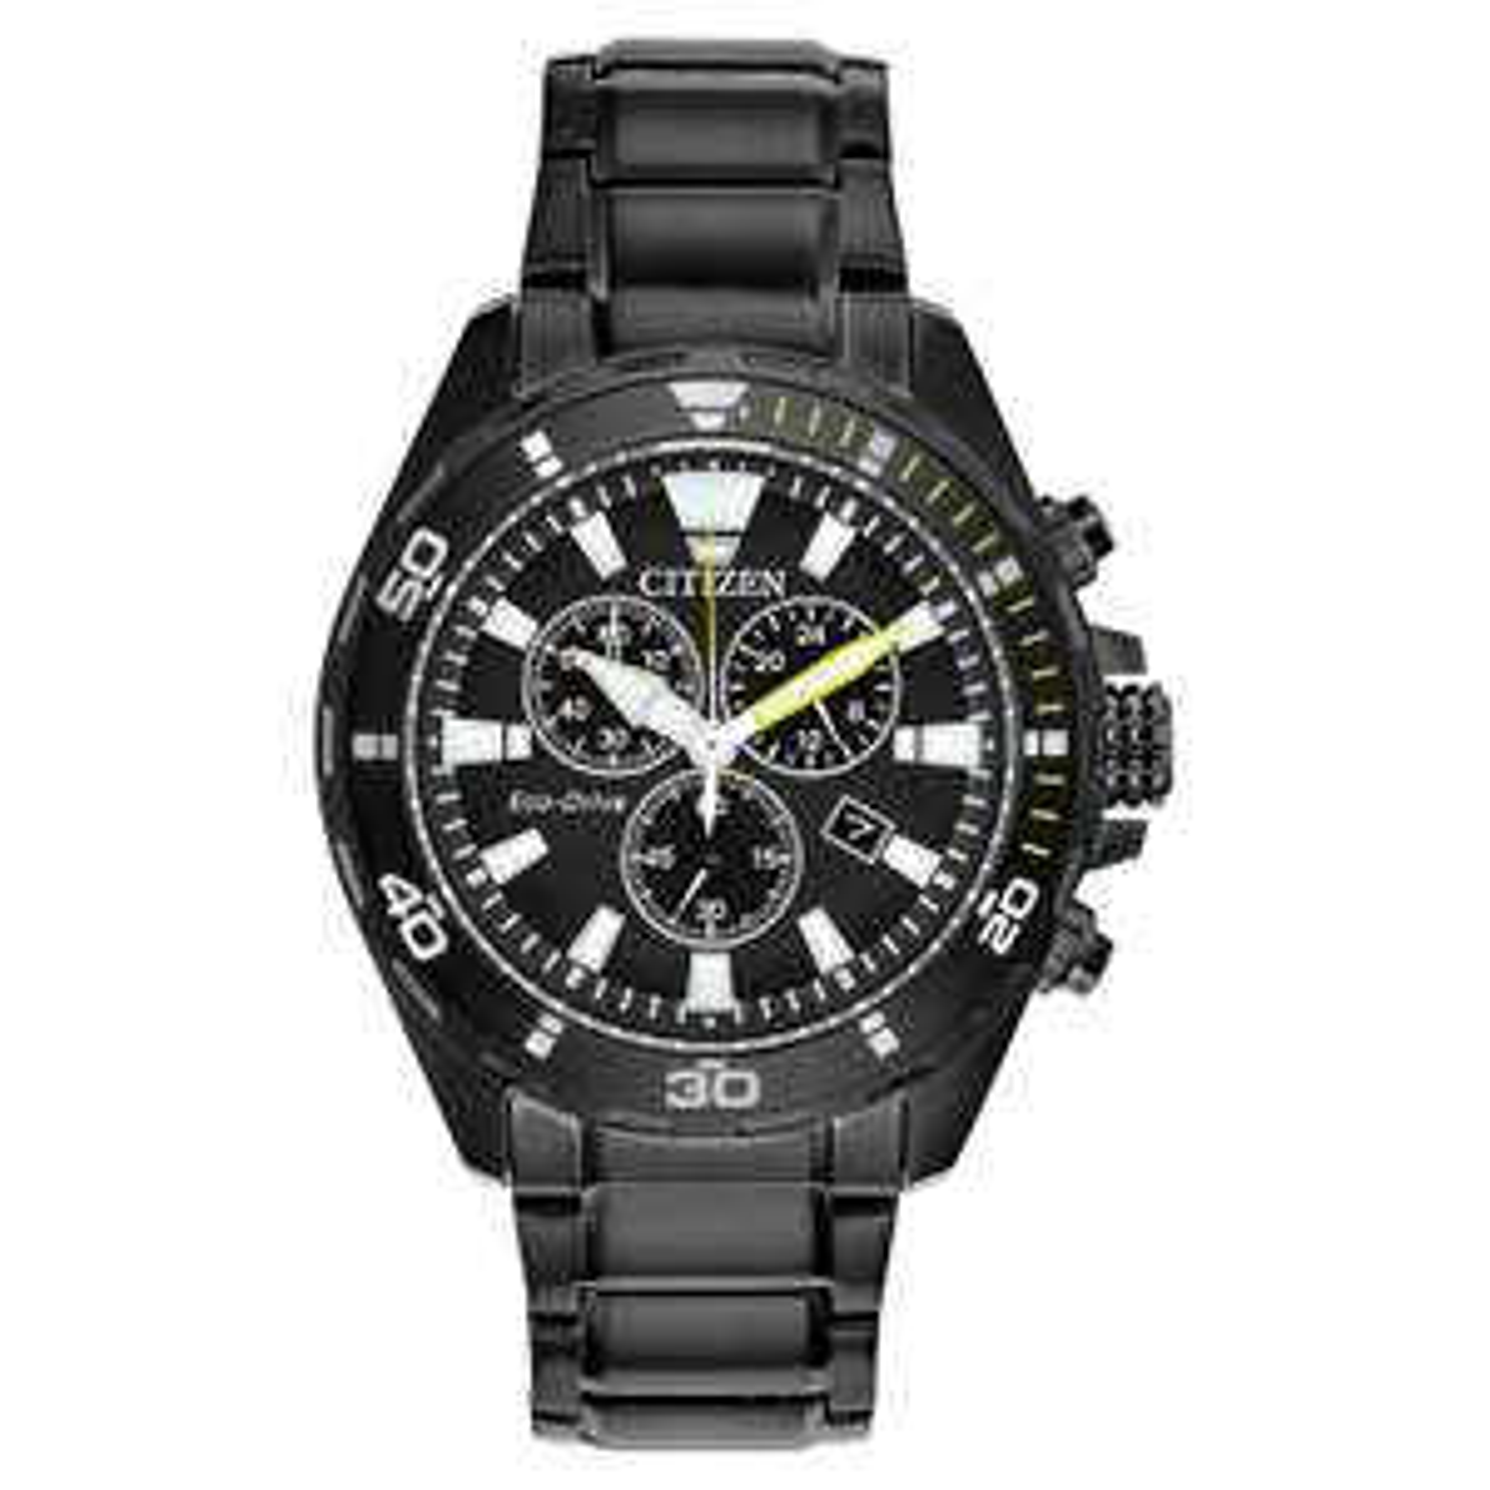 Citizen Eco-Drive Chronograph Men's Black IP Bracelet Watch, £129.99 at H.Samuel with code